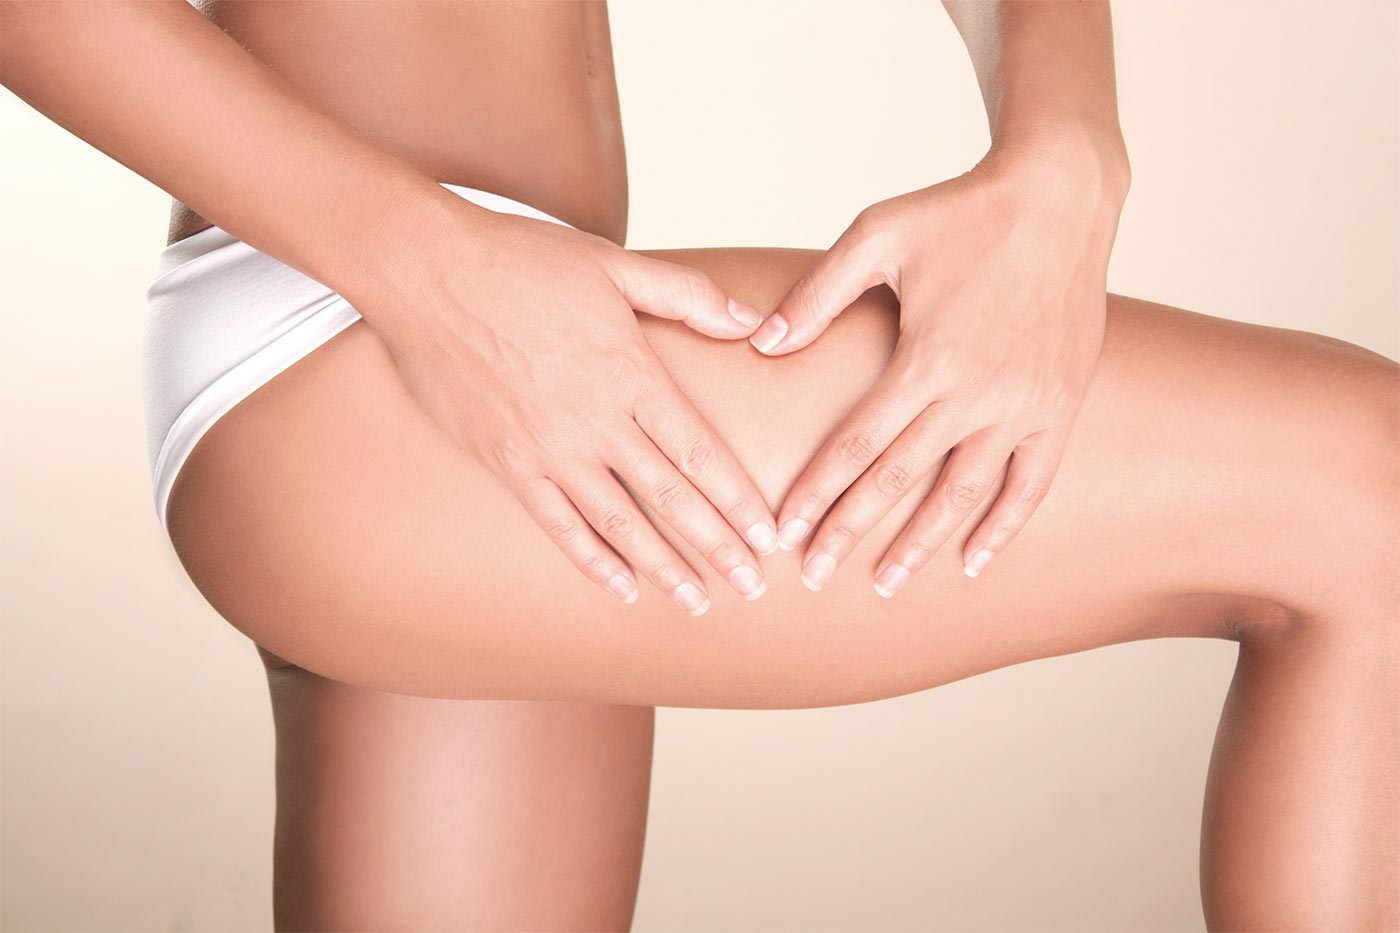 liposukcja ud Kaniowsy Clinic o zabiegu